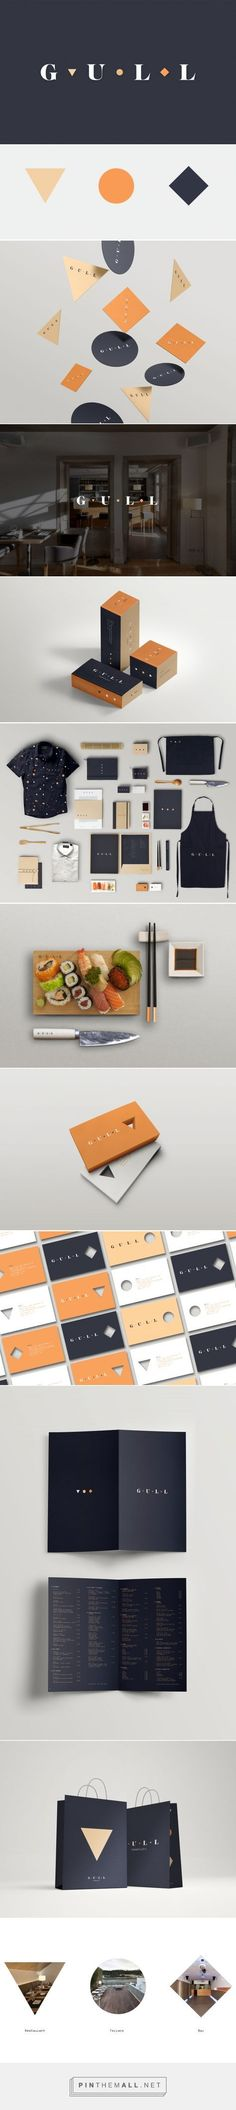 Gull Restaurant Branding by Volta | Fivestar Branding – Design and Branding Agency & Inspiration Gallery